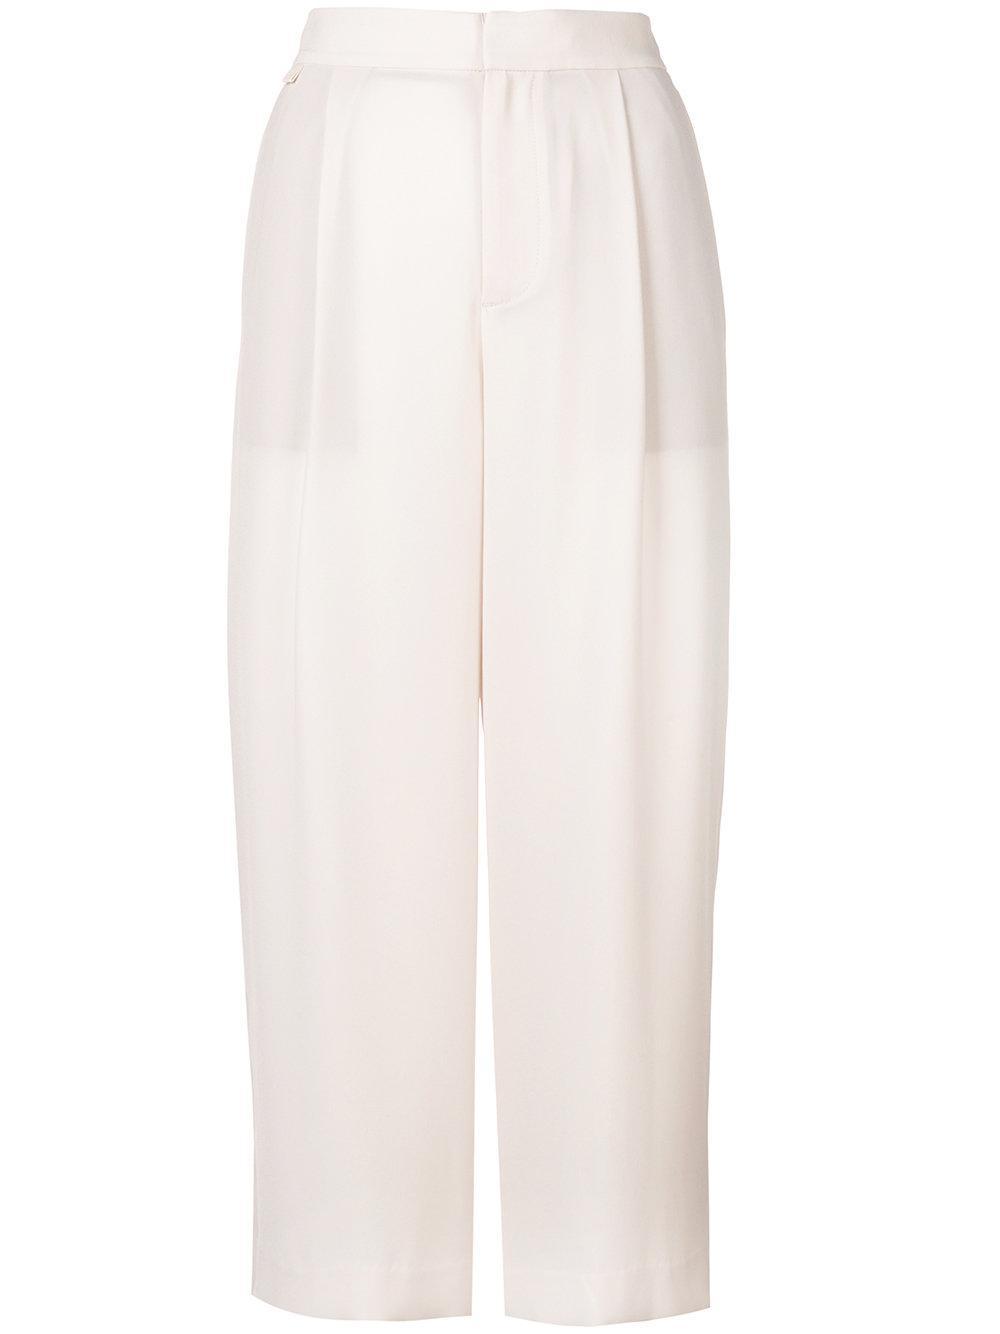 High Waist Cropped Trouser